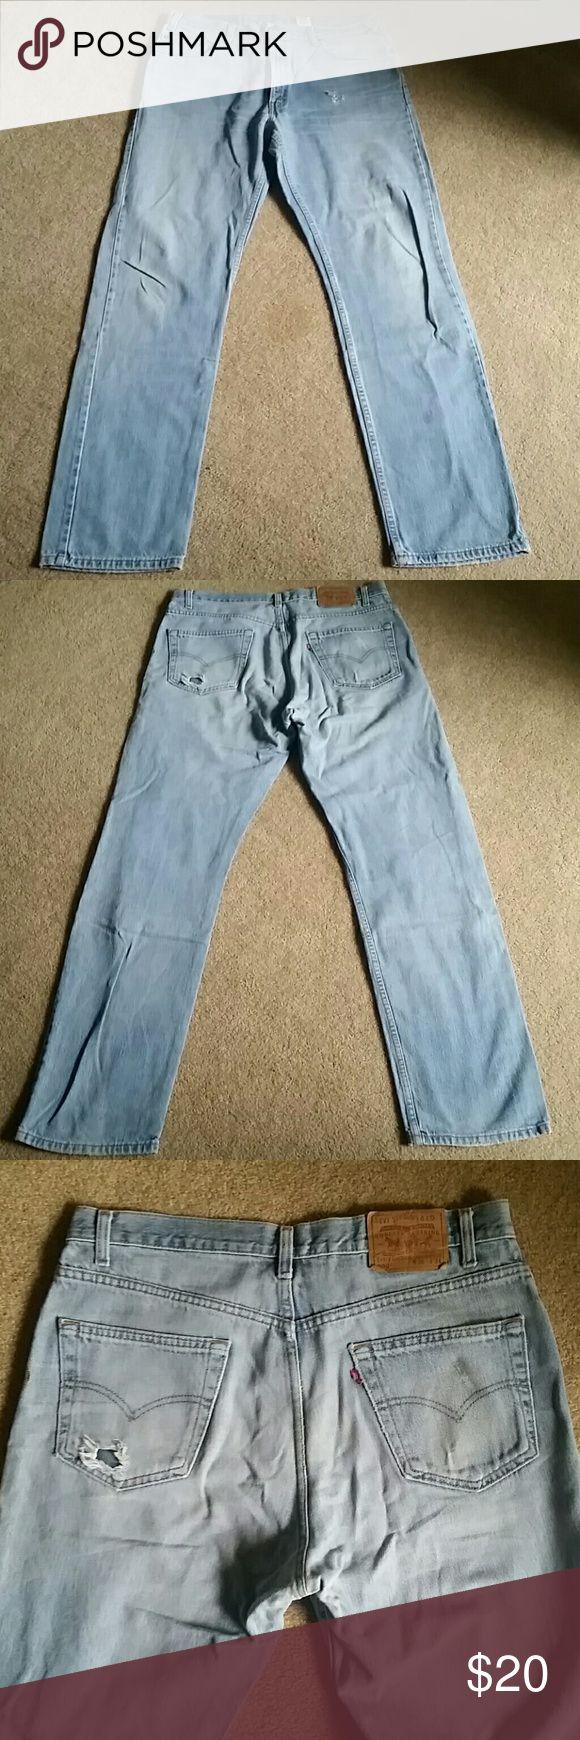 Mens LEVI 505  jeans. Regular Fit Straight Leg LEVI 505 JEANS. REG FIT. STRAIGHT LEG. Light blue wash distressed jeans. like new cond. Size 36 X 34. Levi's Jeans Straight